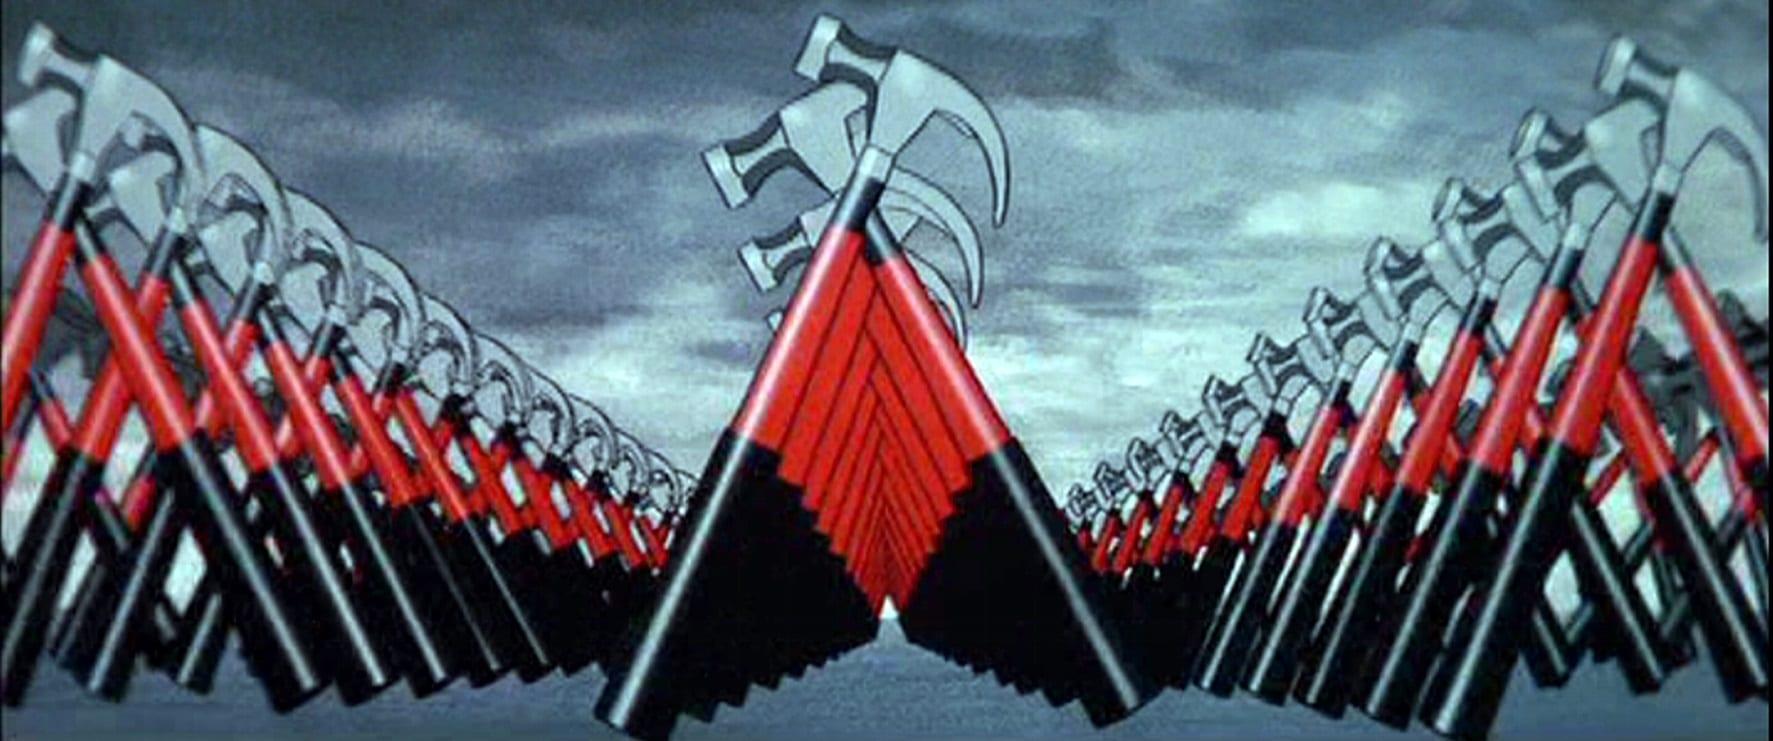 Mr Pink Floyd tifa Maduro, Mr Virgin tifa Guaidó. Grande musica divisa sul futuro del Venezuela